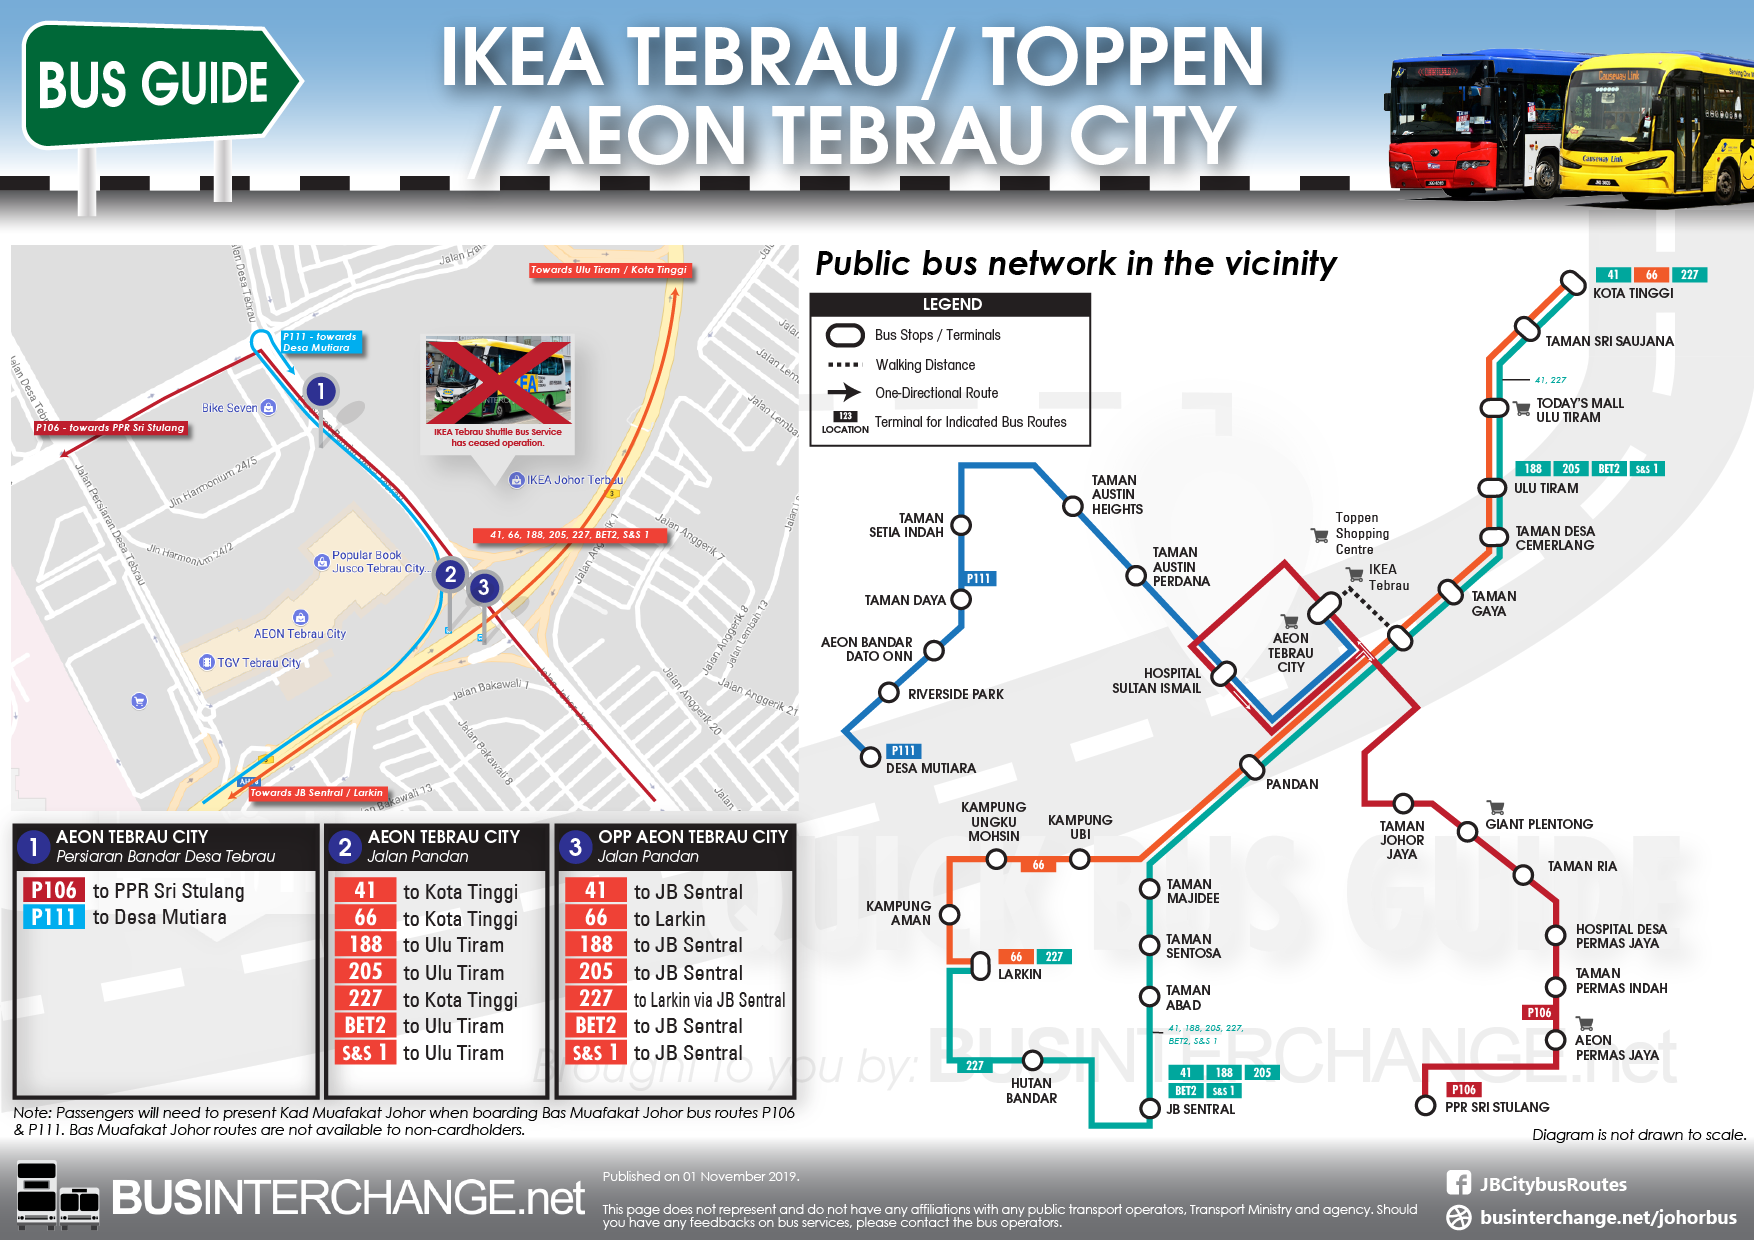 Bus Services To IKEA Tebrau, Toppen & AEON Tebrau City - Bus ...